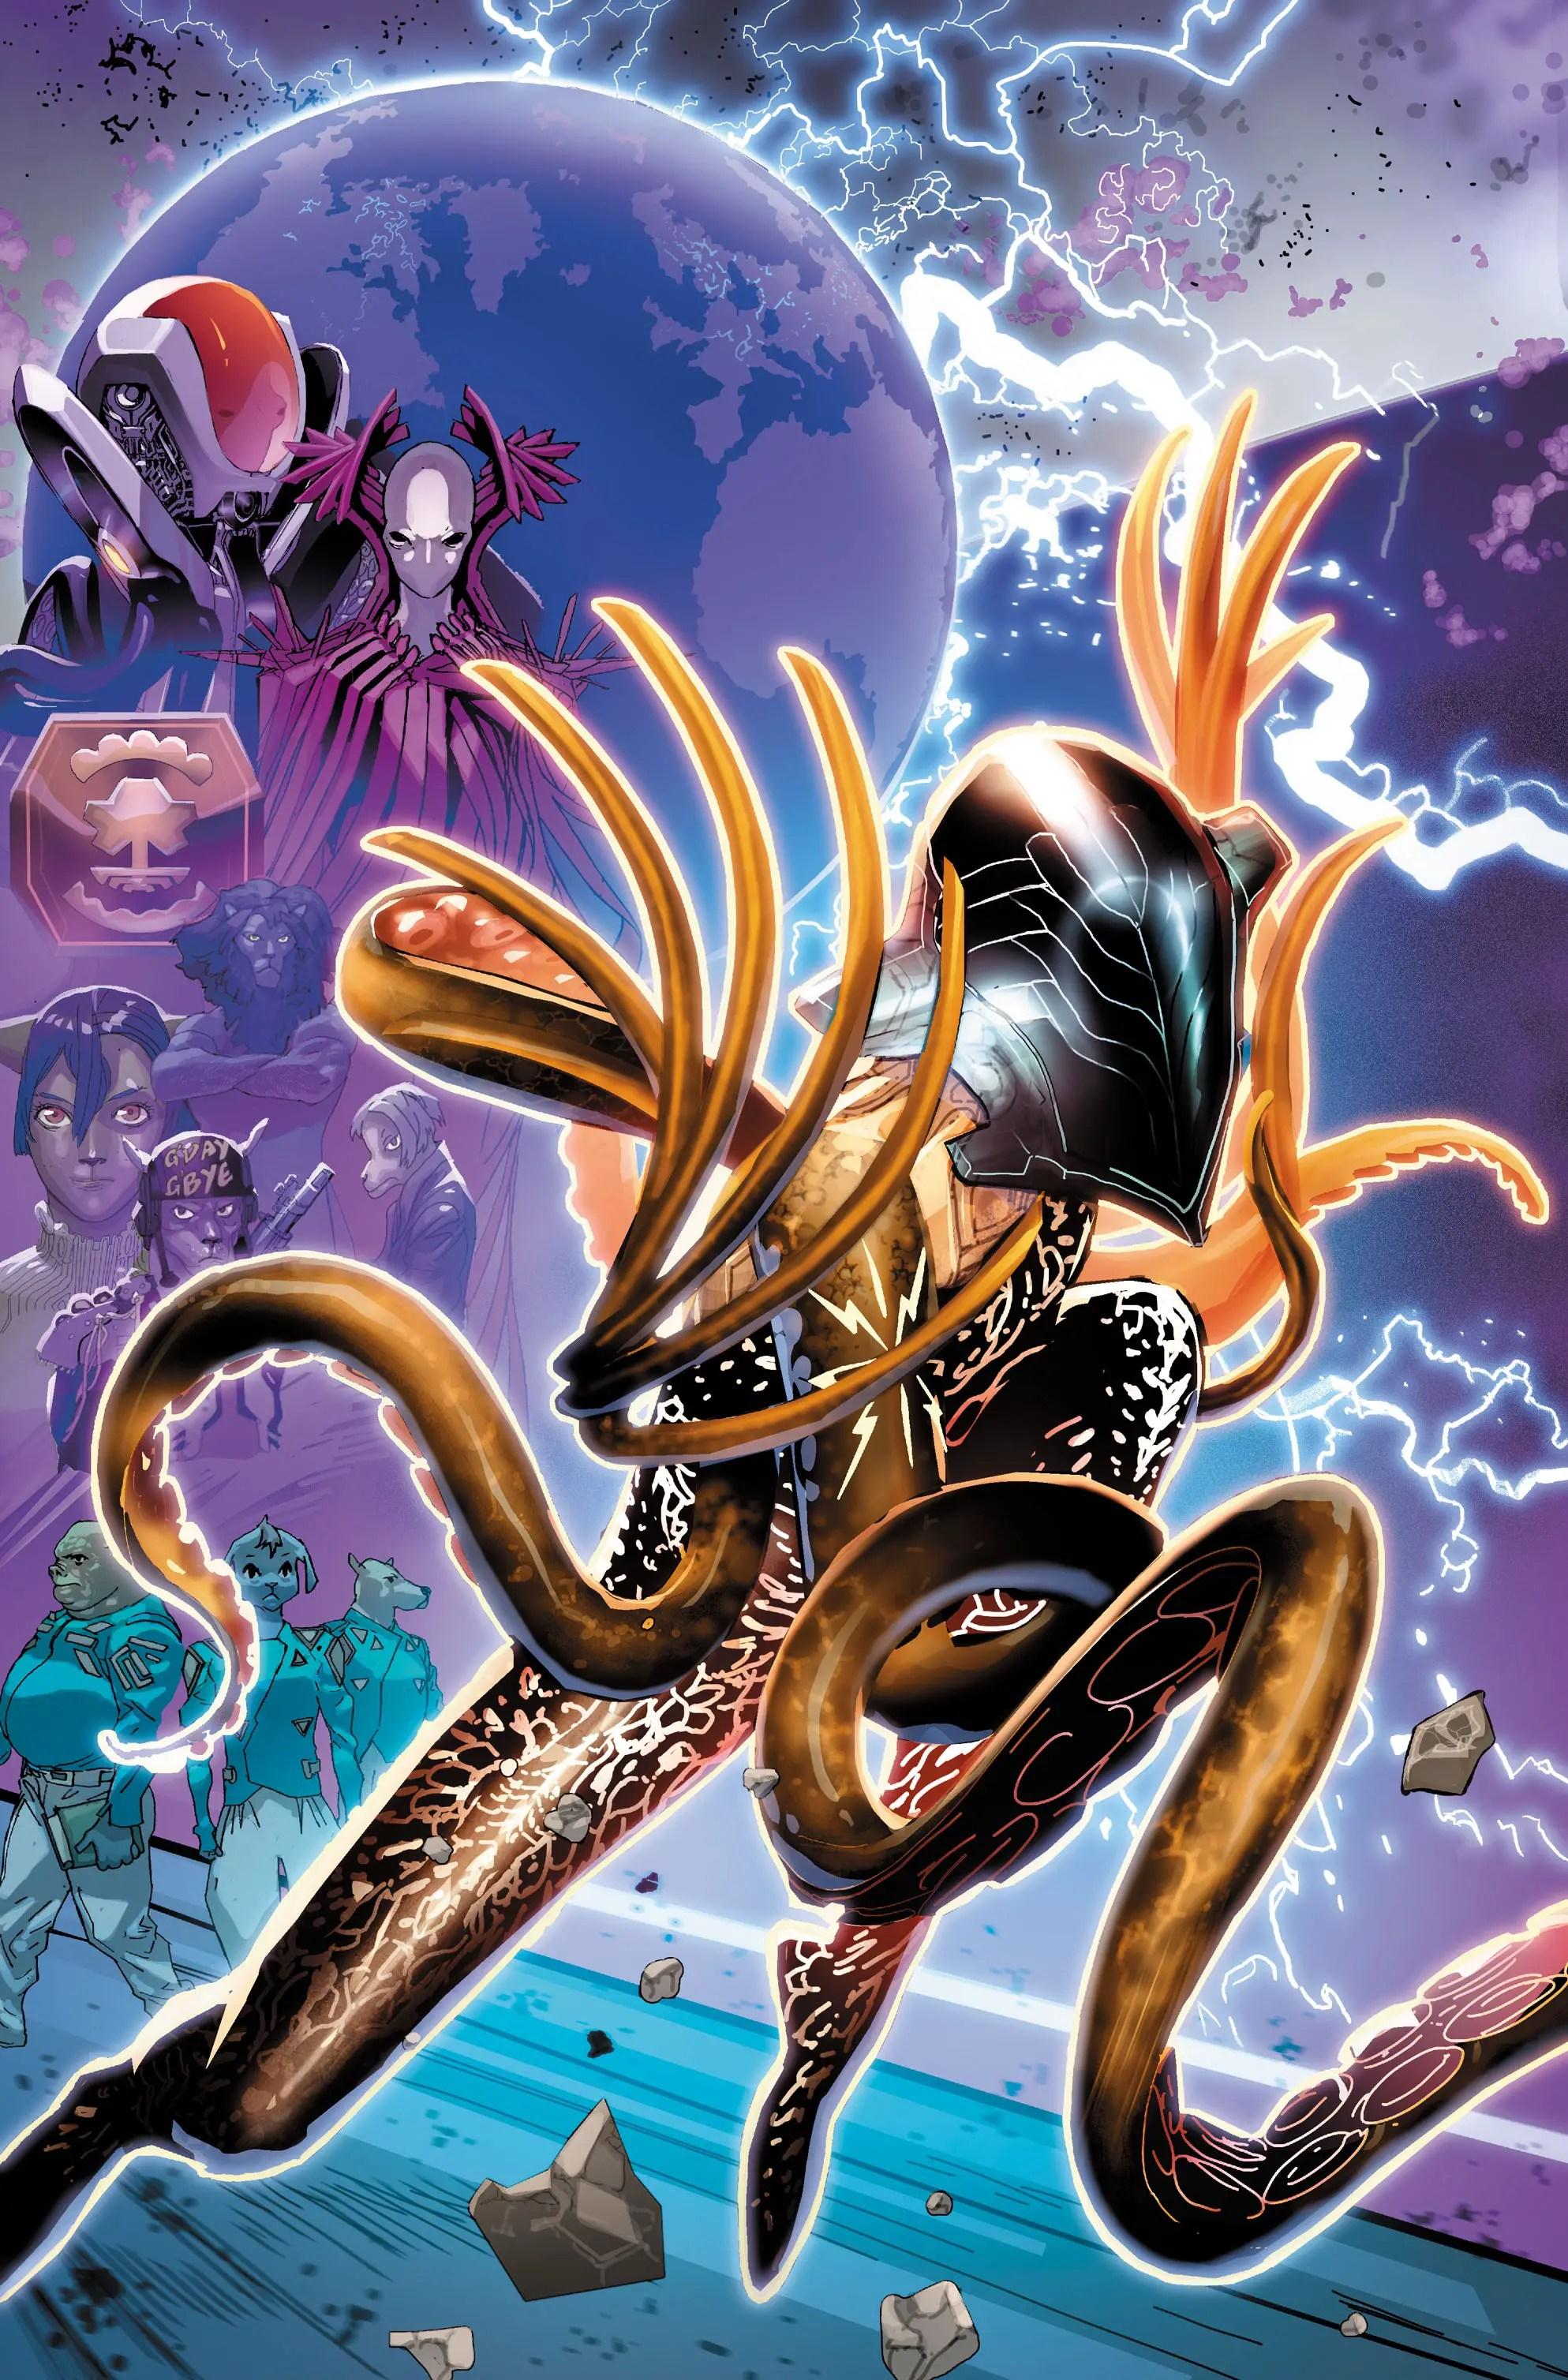 Electric Warriors #2 review: The battles begin